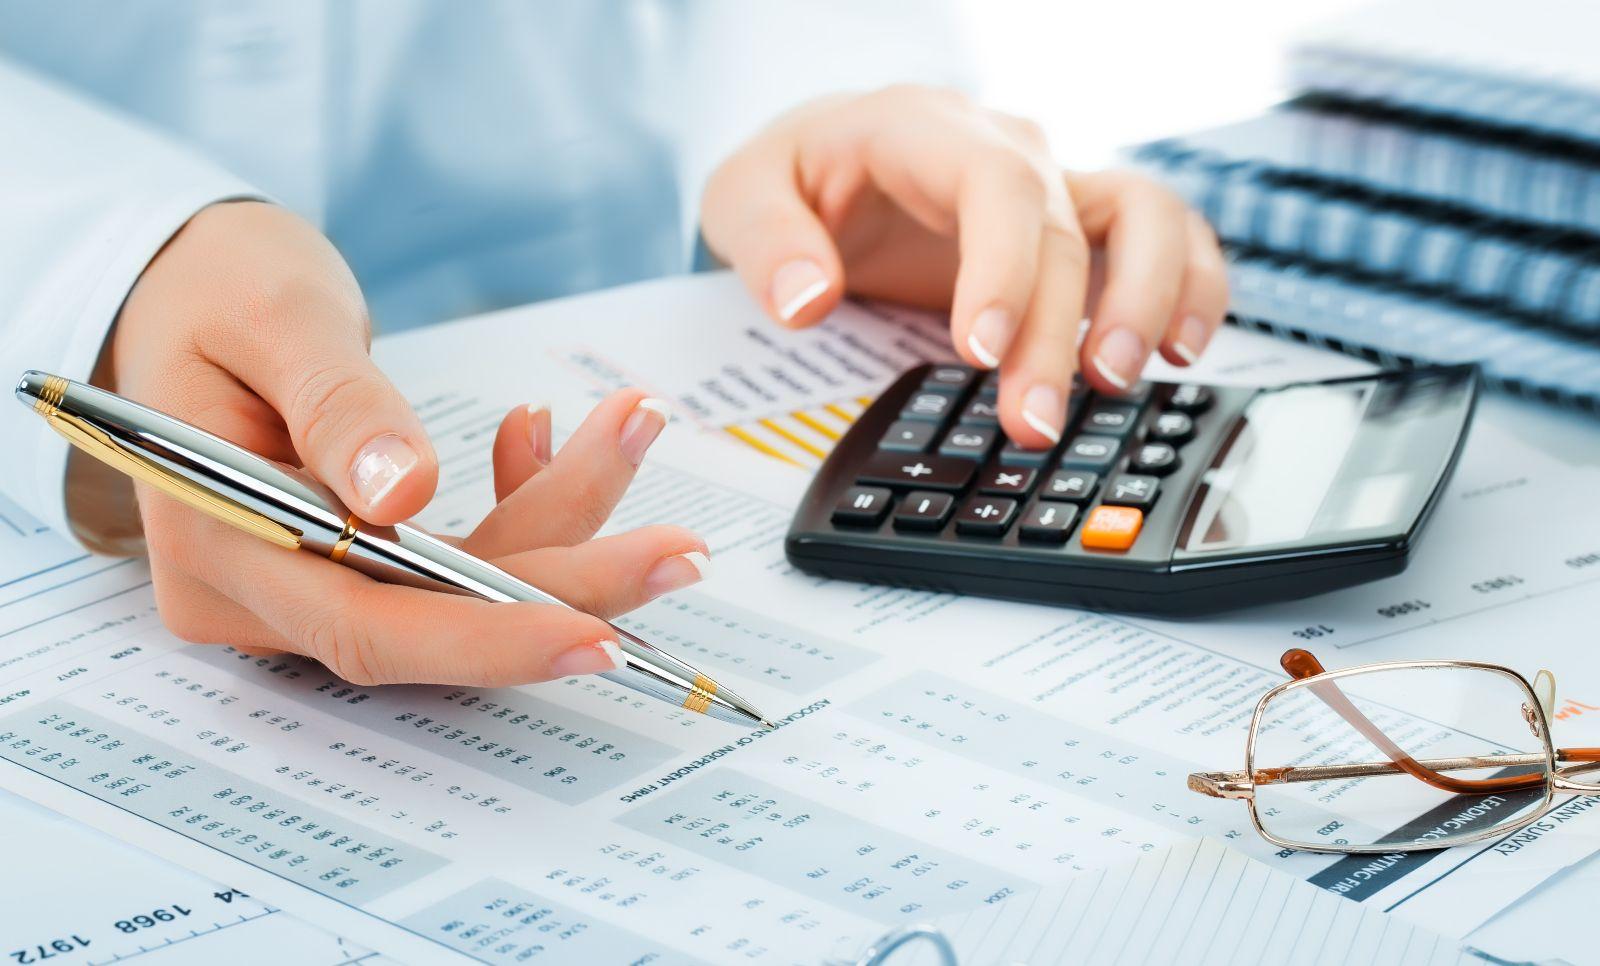 audit professional man working, man working, pen in hand